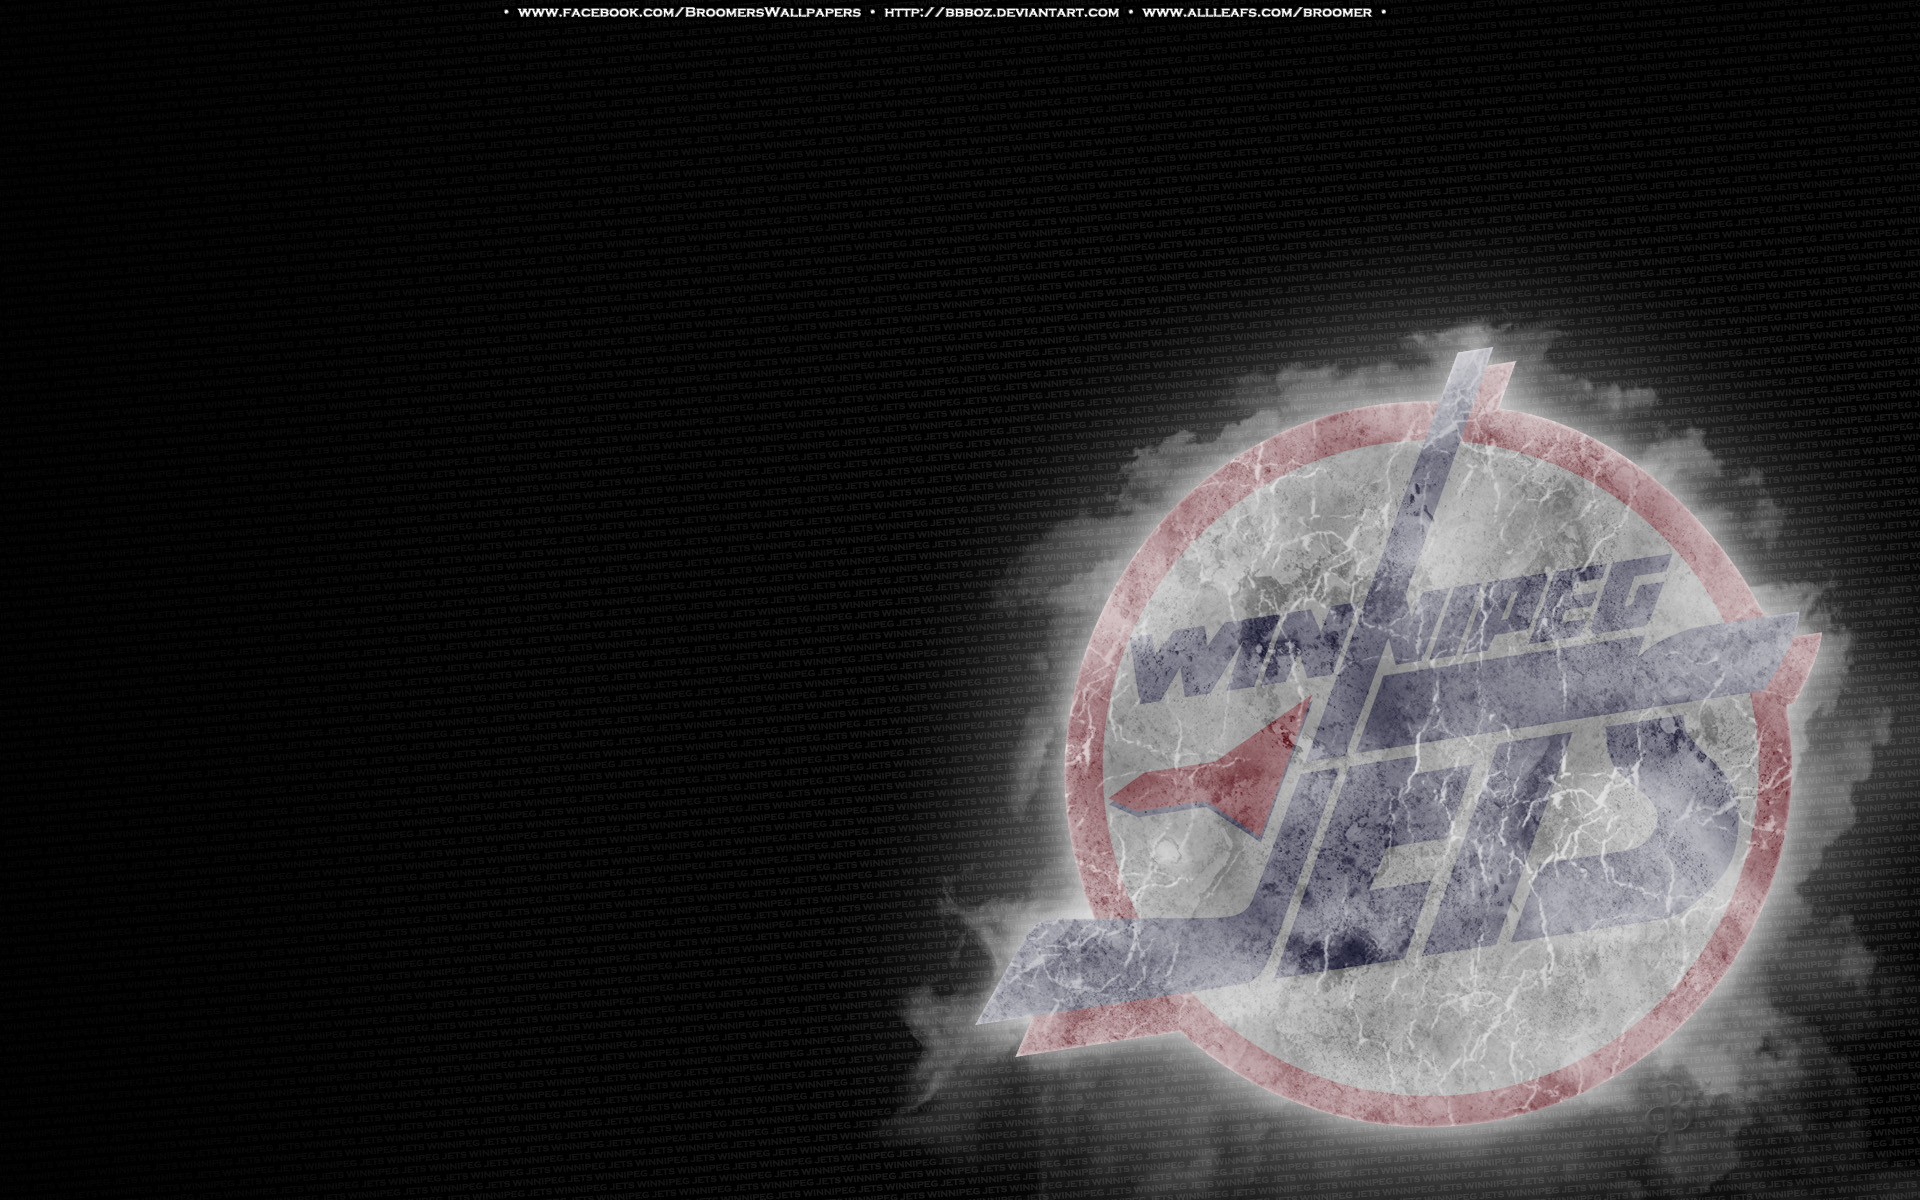 bbbozdeviantartcomWinnipeg Jets Retro Ice by bbboz on deviantART 1920x1200